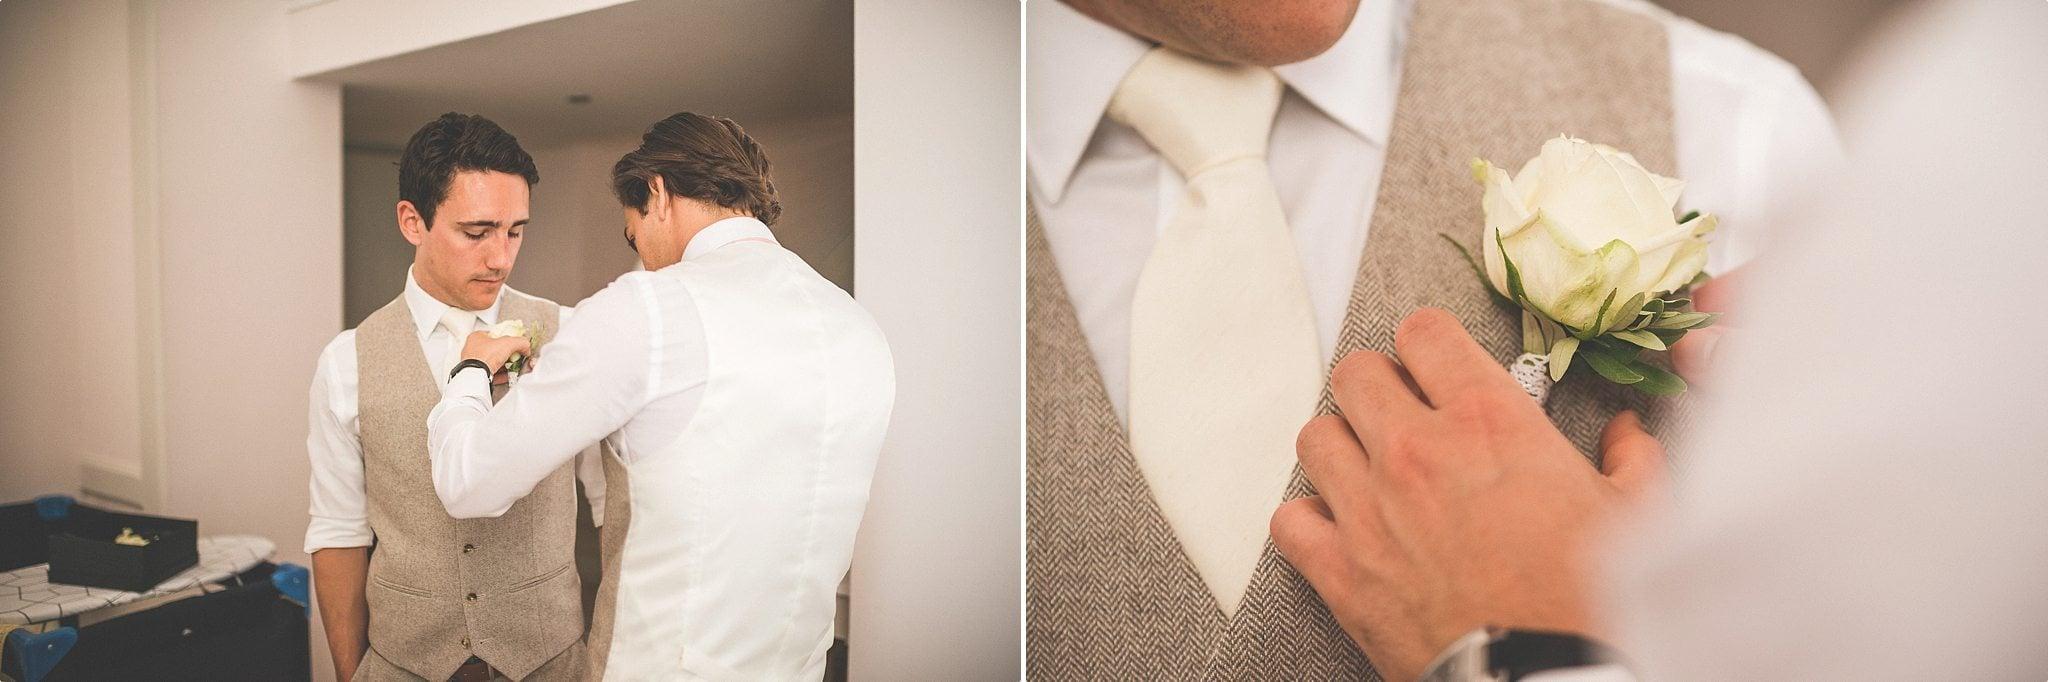 Domaine de la Croix - Wedding - Maria Assia Photography-65